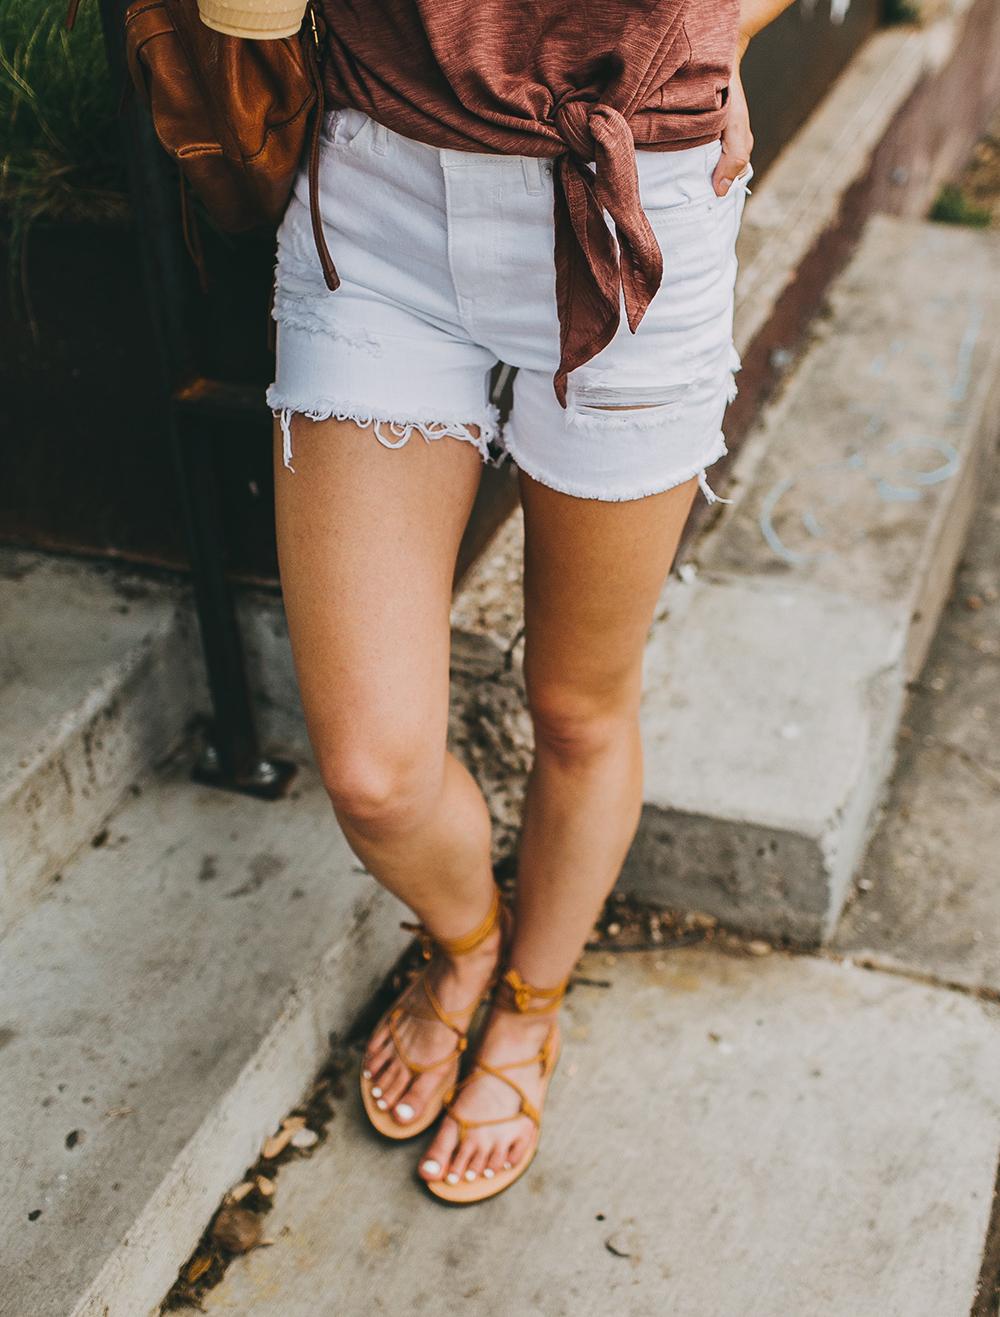 livvyland-blog-olivia-watson-express-one-eleven-knot-front-v-neck-tee-austin-texas-fashion-blogger-5